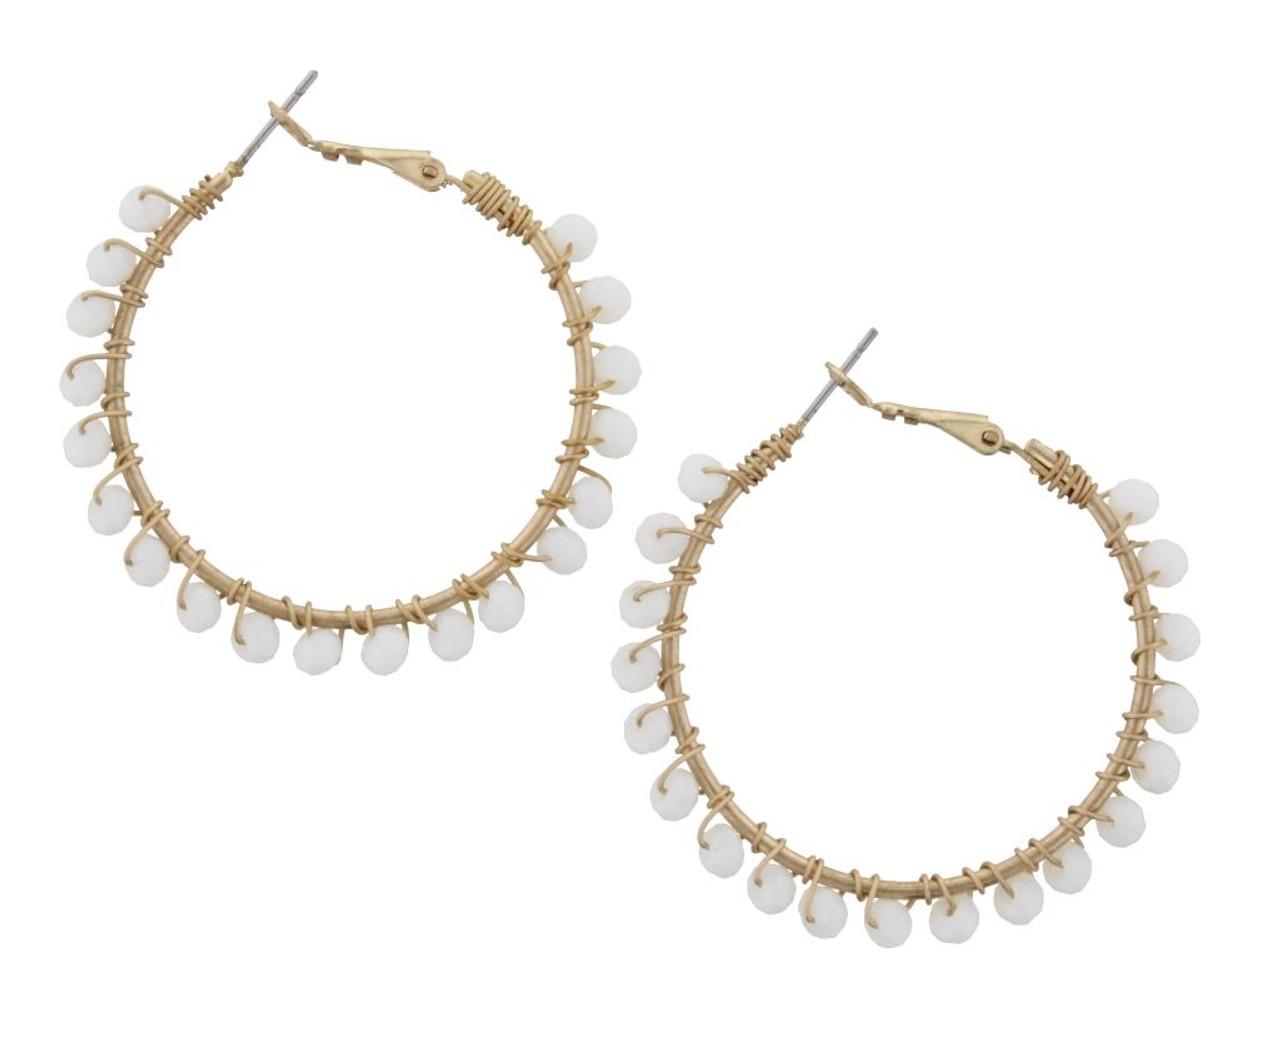 Beaded Wire Wrapped Hoop Earrings - White - Cordial Lee